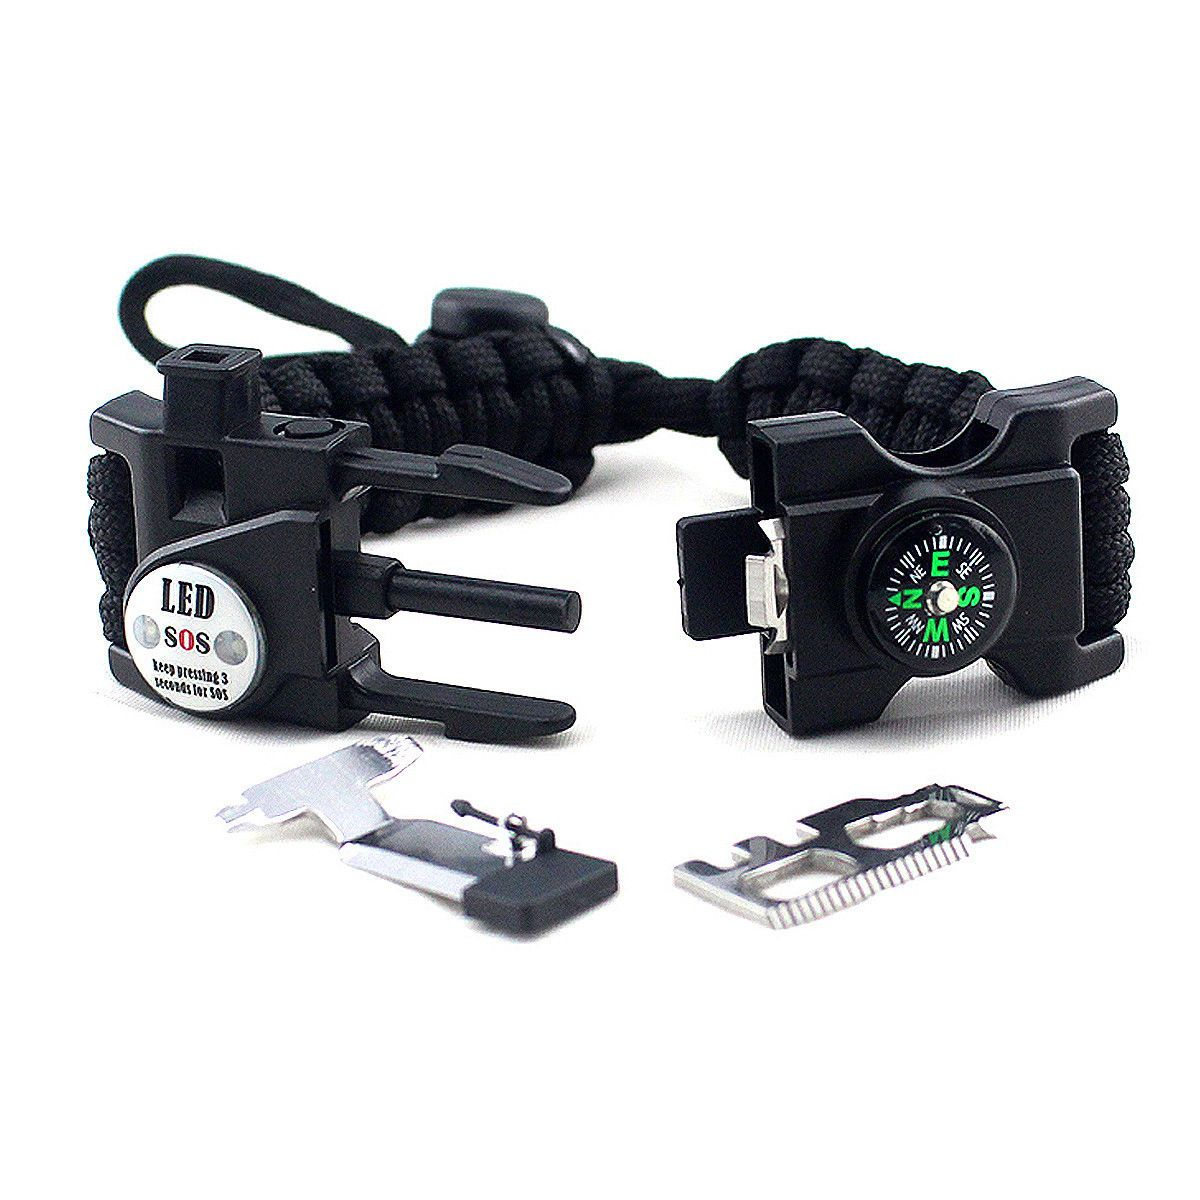 Outdoor Survival Paracord Bracelet Flint Fire Starter Whistle Compass Gear S/&K